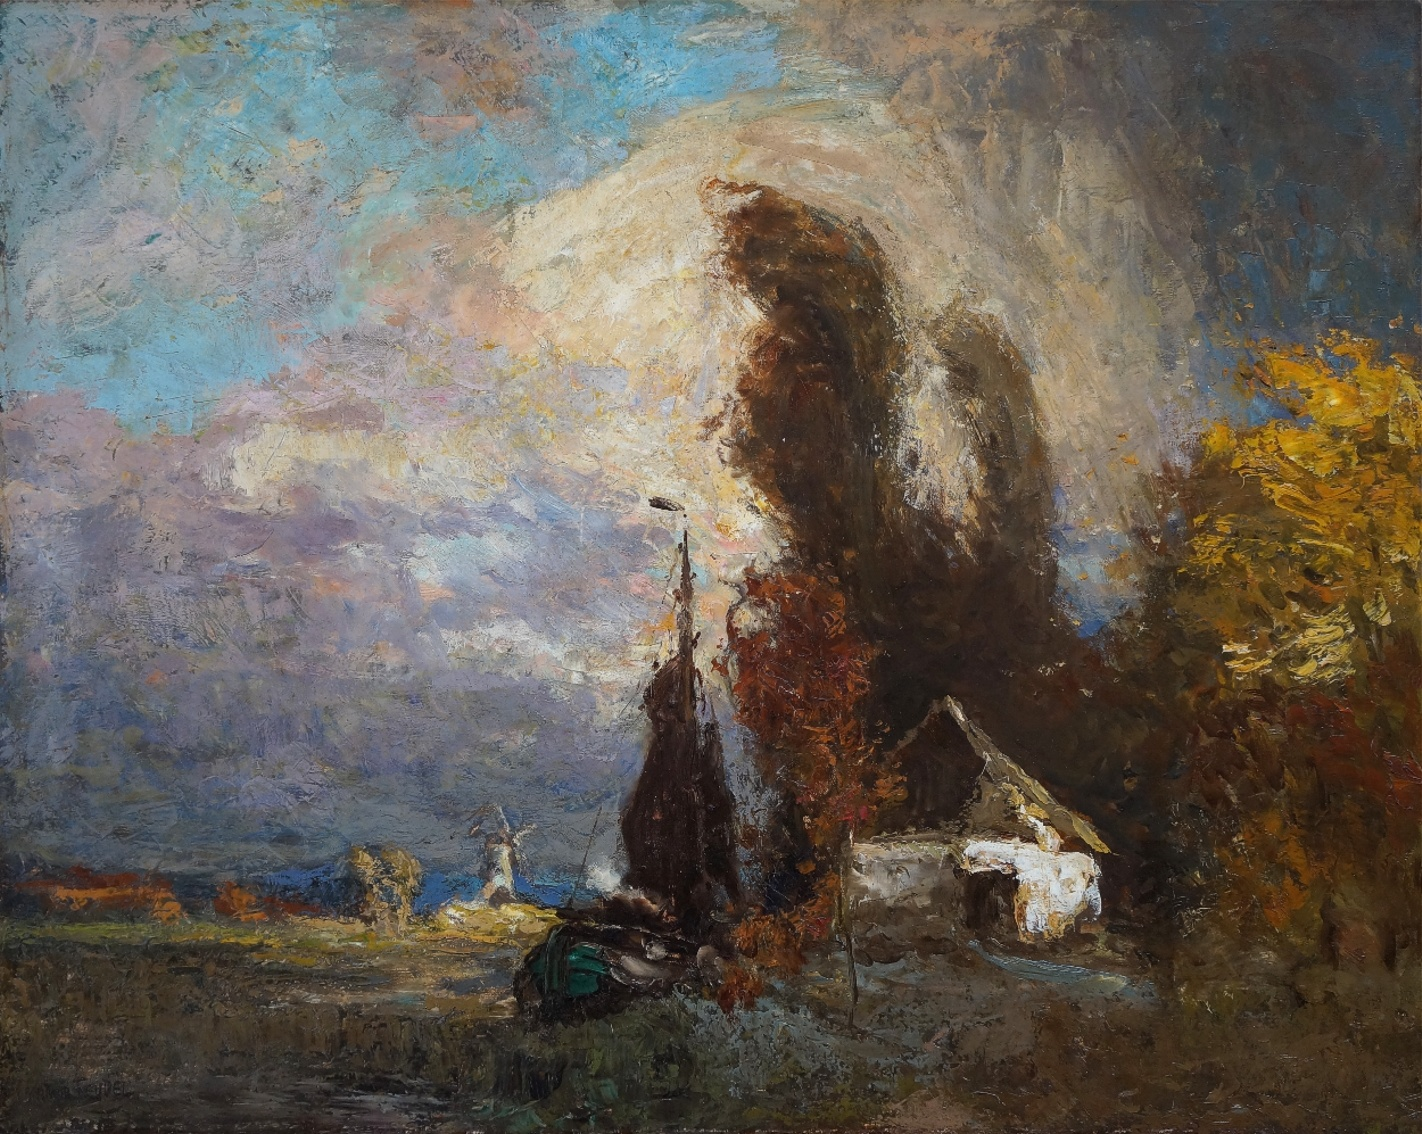 Arthur Feudel (1857 - 1929) » Öl-Gemälde Impressionismus Landschaft